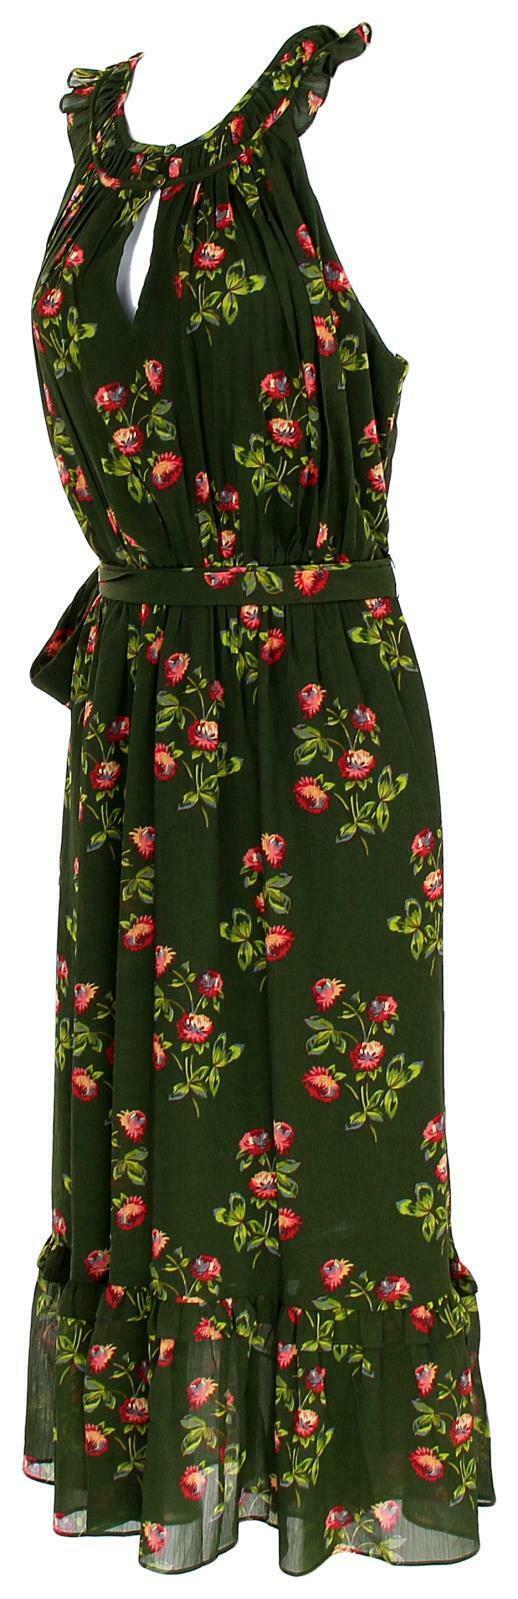 J Crew Women's Point Sur High-Neck Ruffle Floral Dress Chiffon 4 J5088 image 3